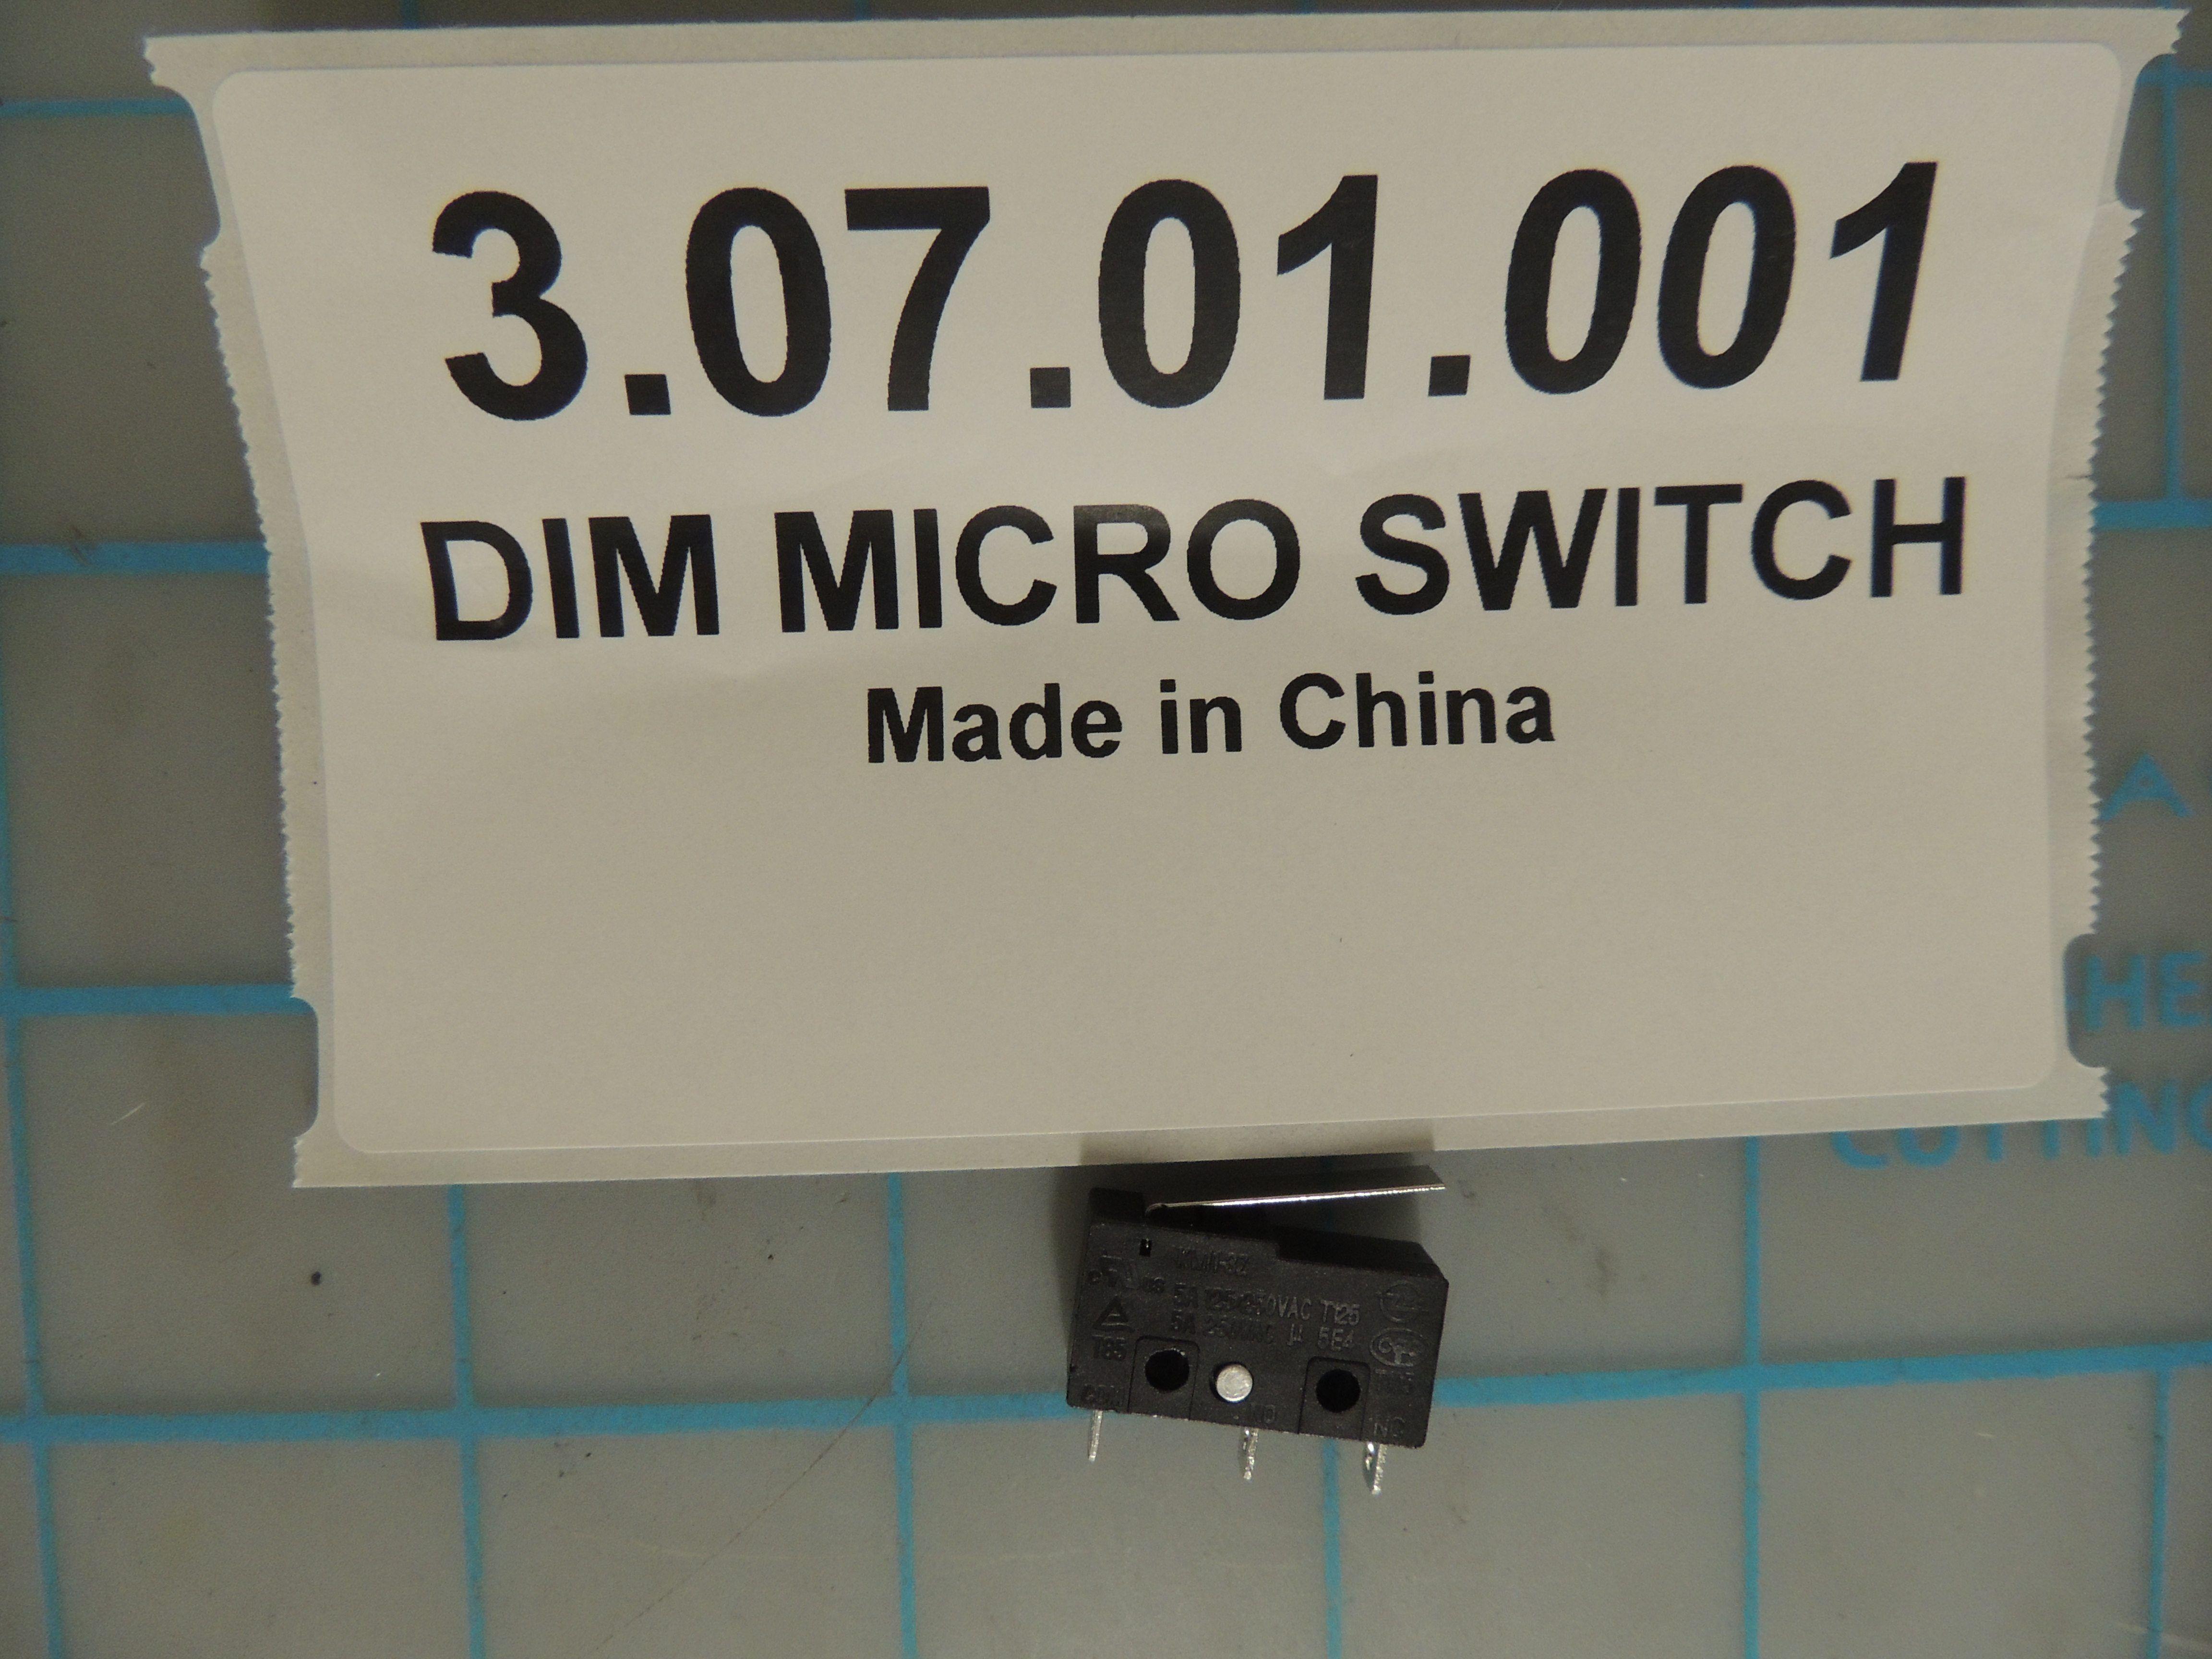 DIM MICRO SWITCH